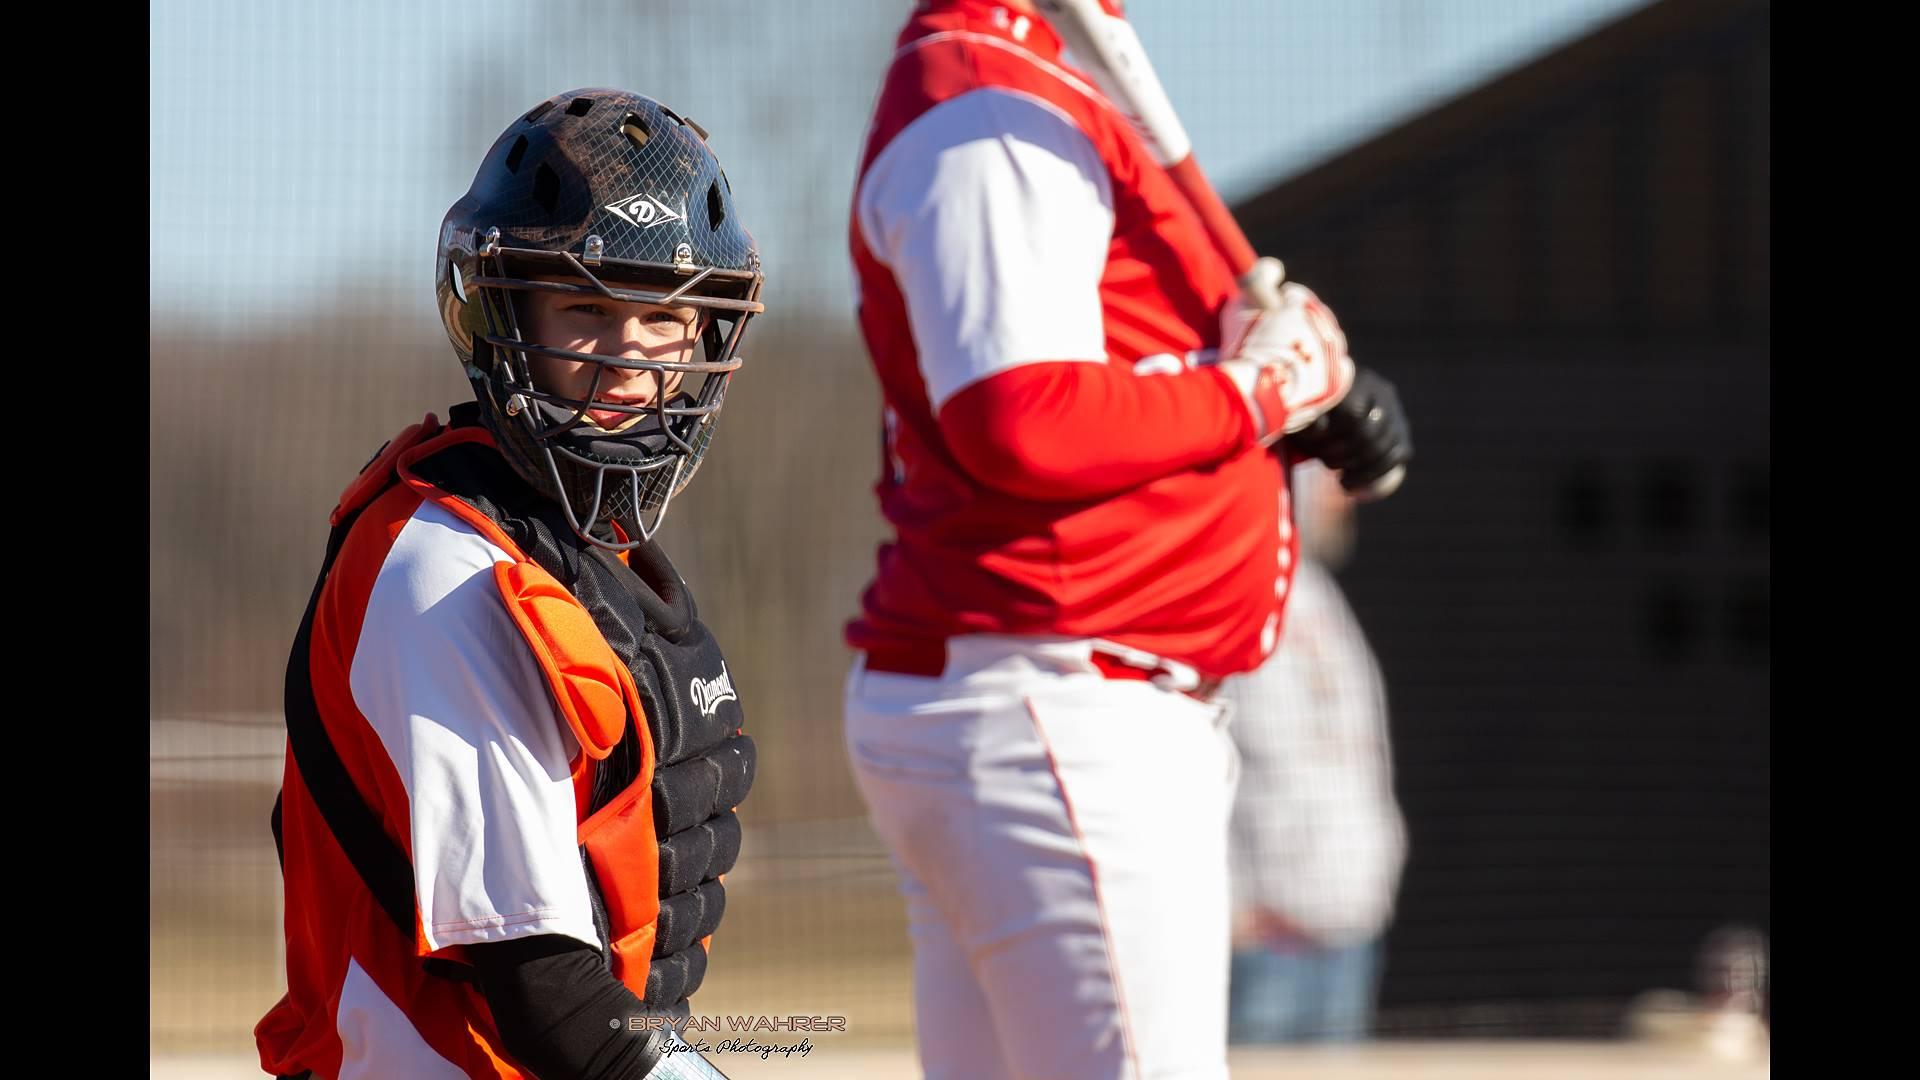 Baseball Catcher and Batter